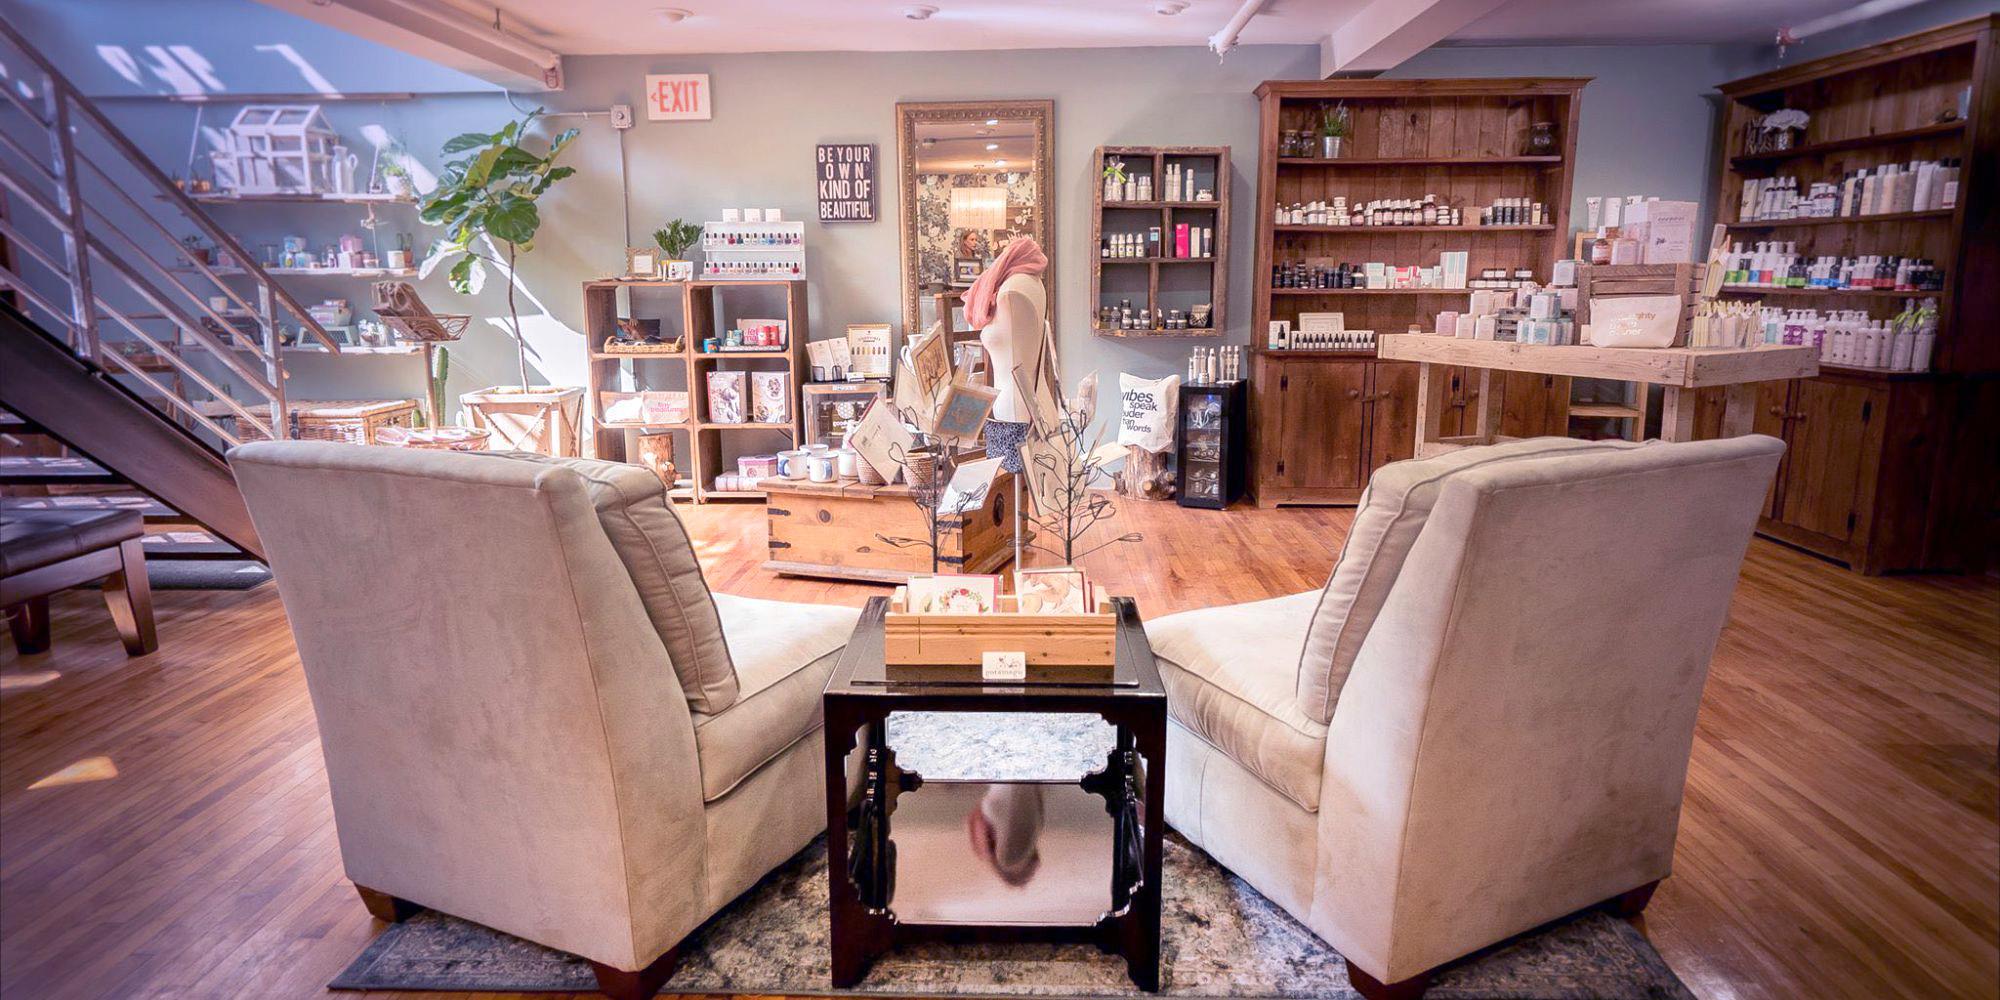 The Truth Beauty Company's Jennifer Freitas Stays Ambitious Amid The Retail Apocalypse